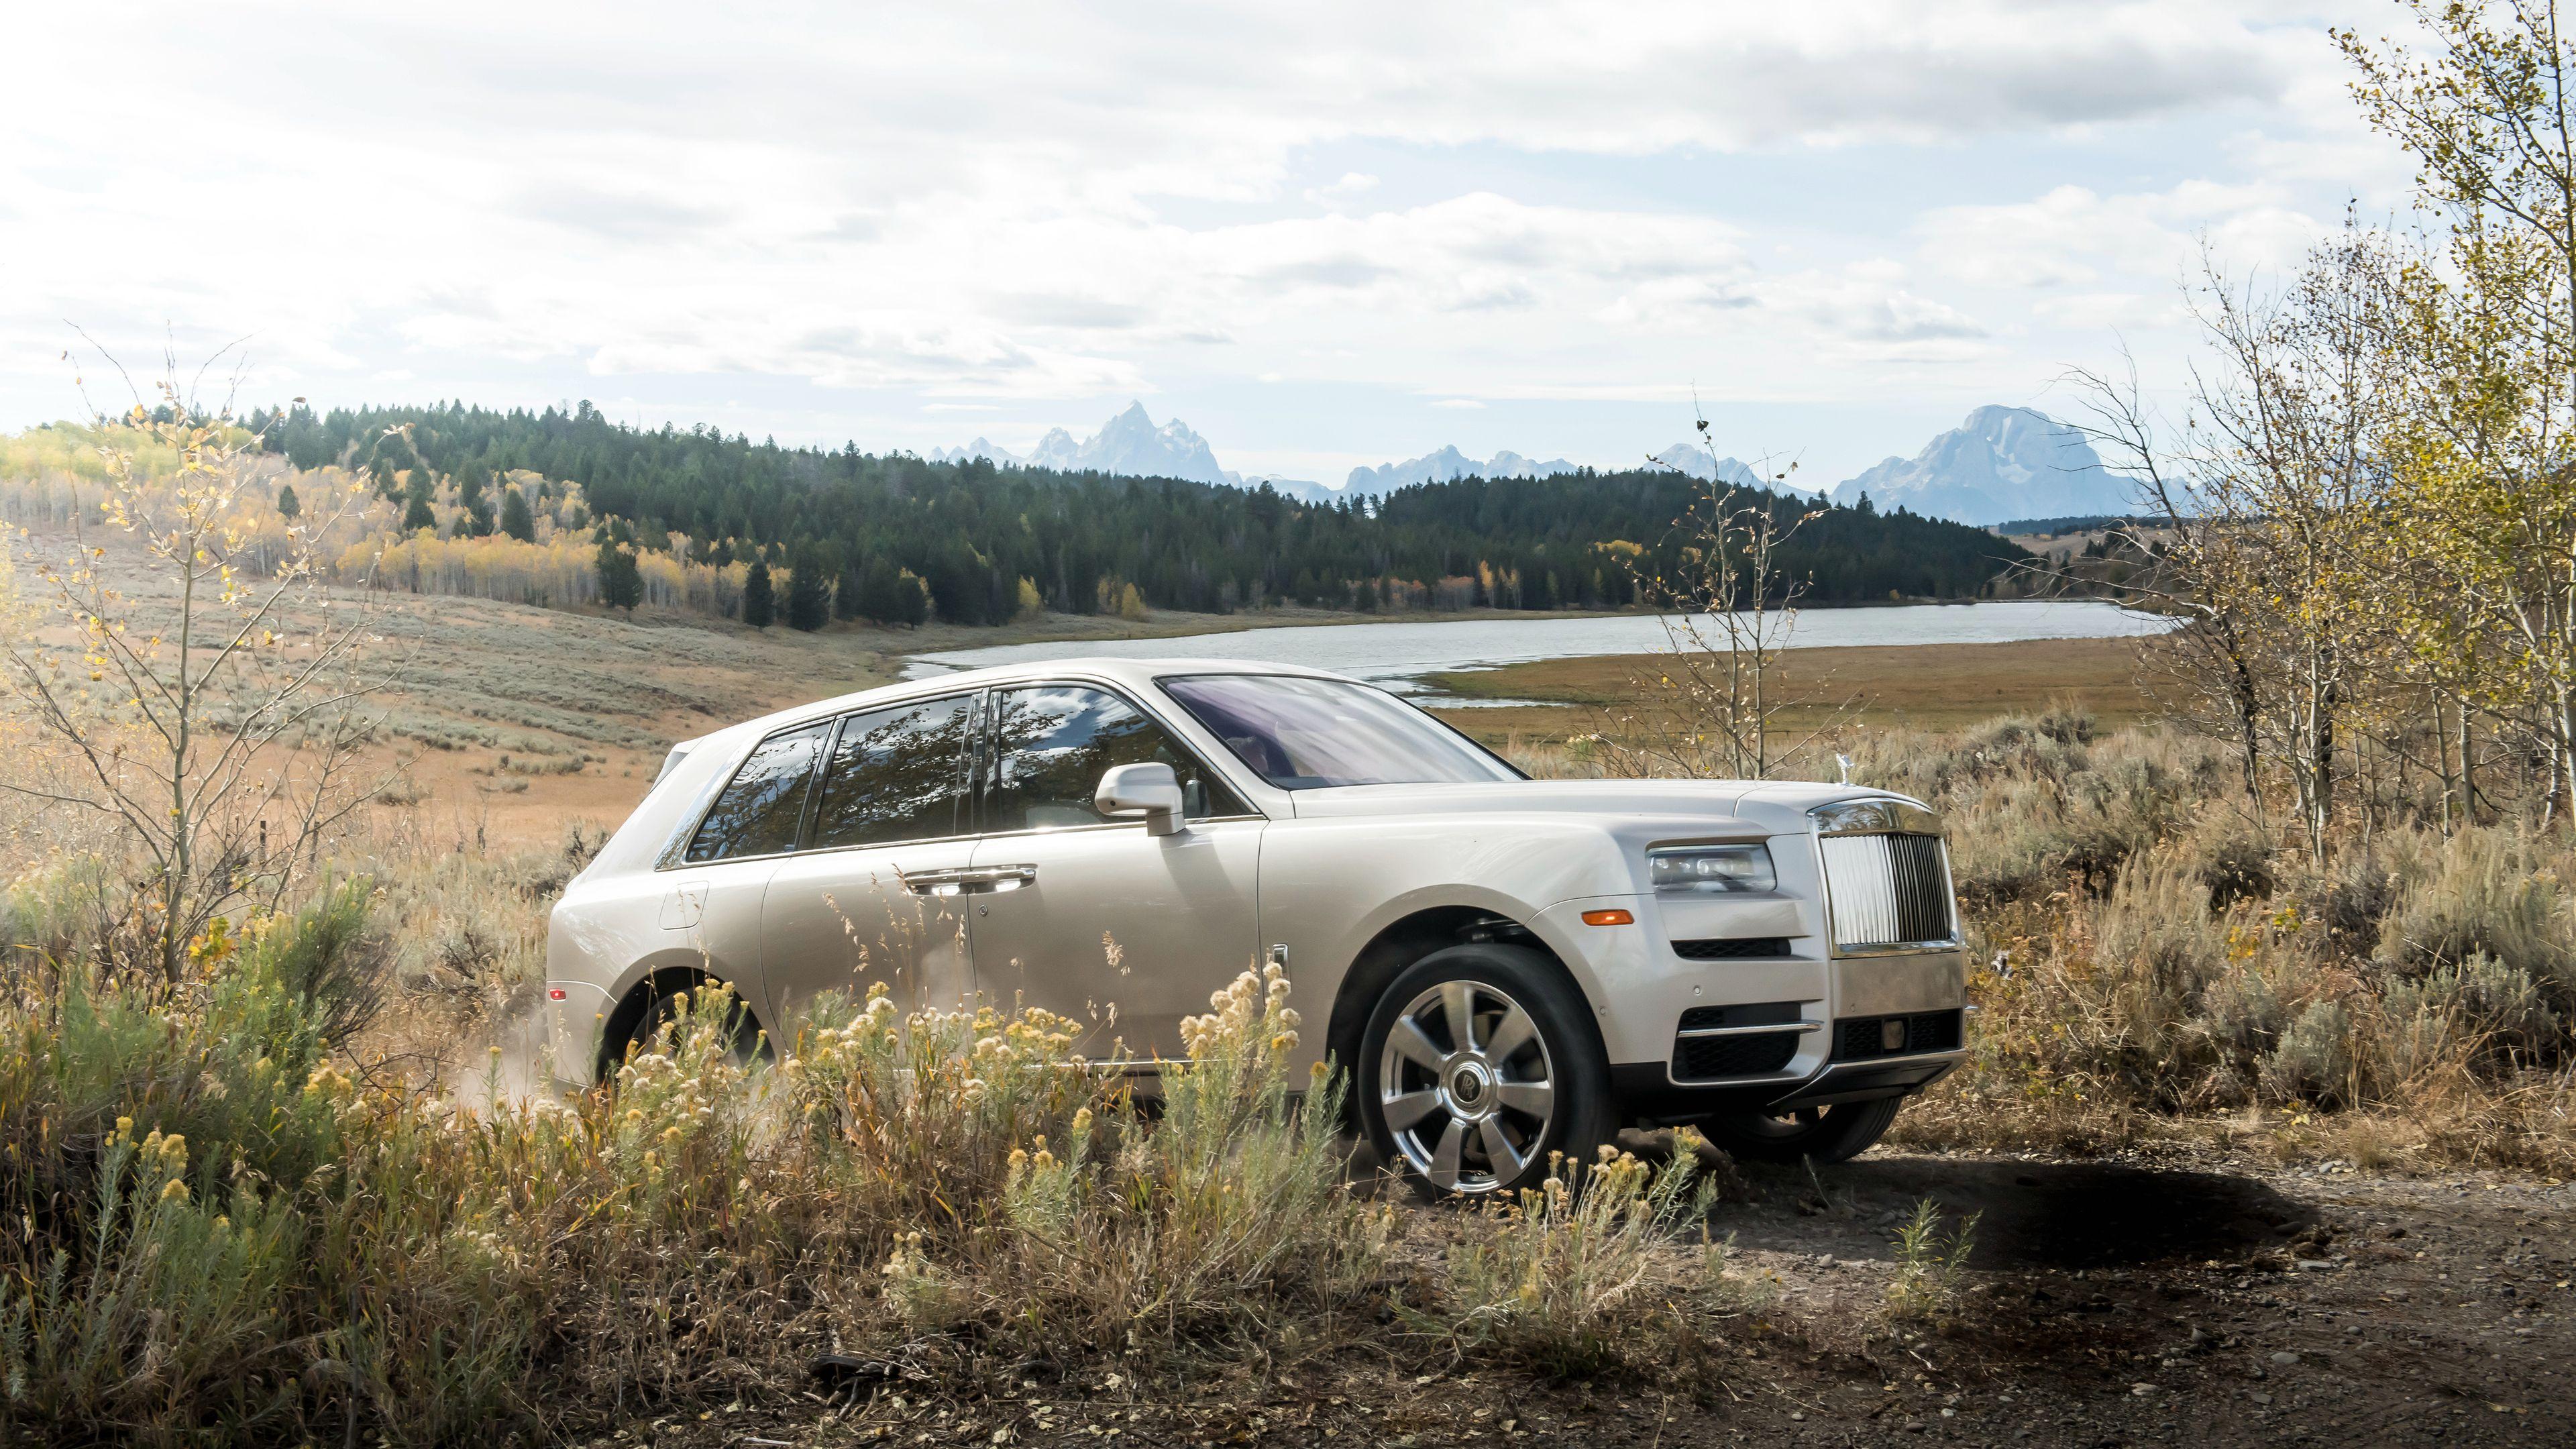 Wallpaper 4k 2019 Rolls Royce Suv Cullinan 4k 2019 Cars Wallpapers